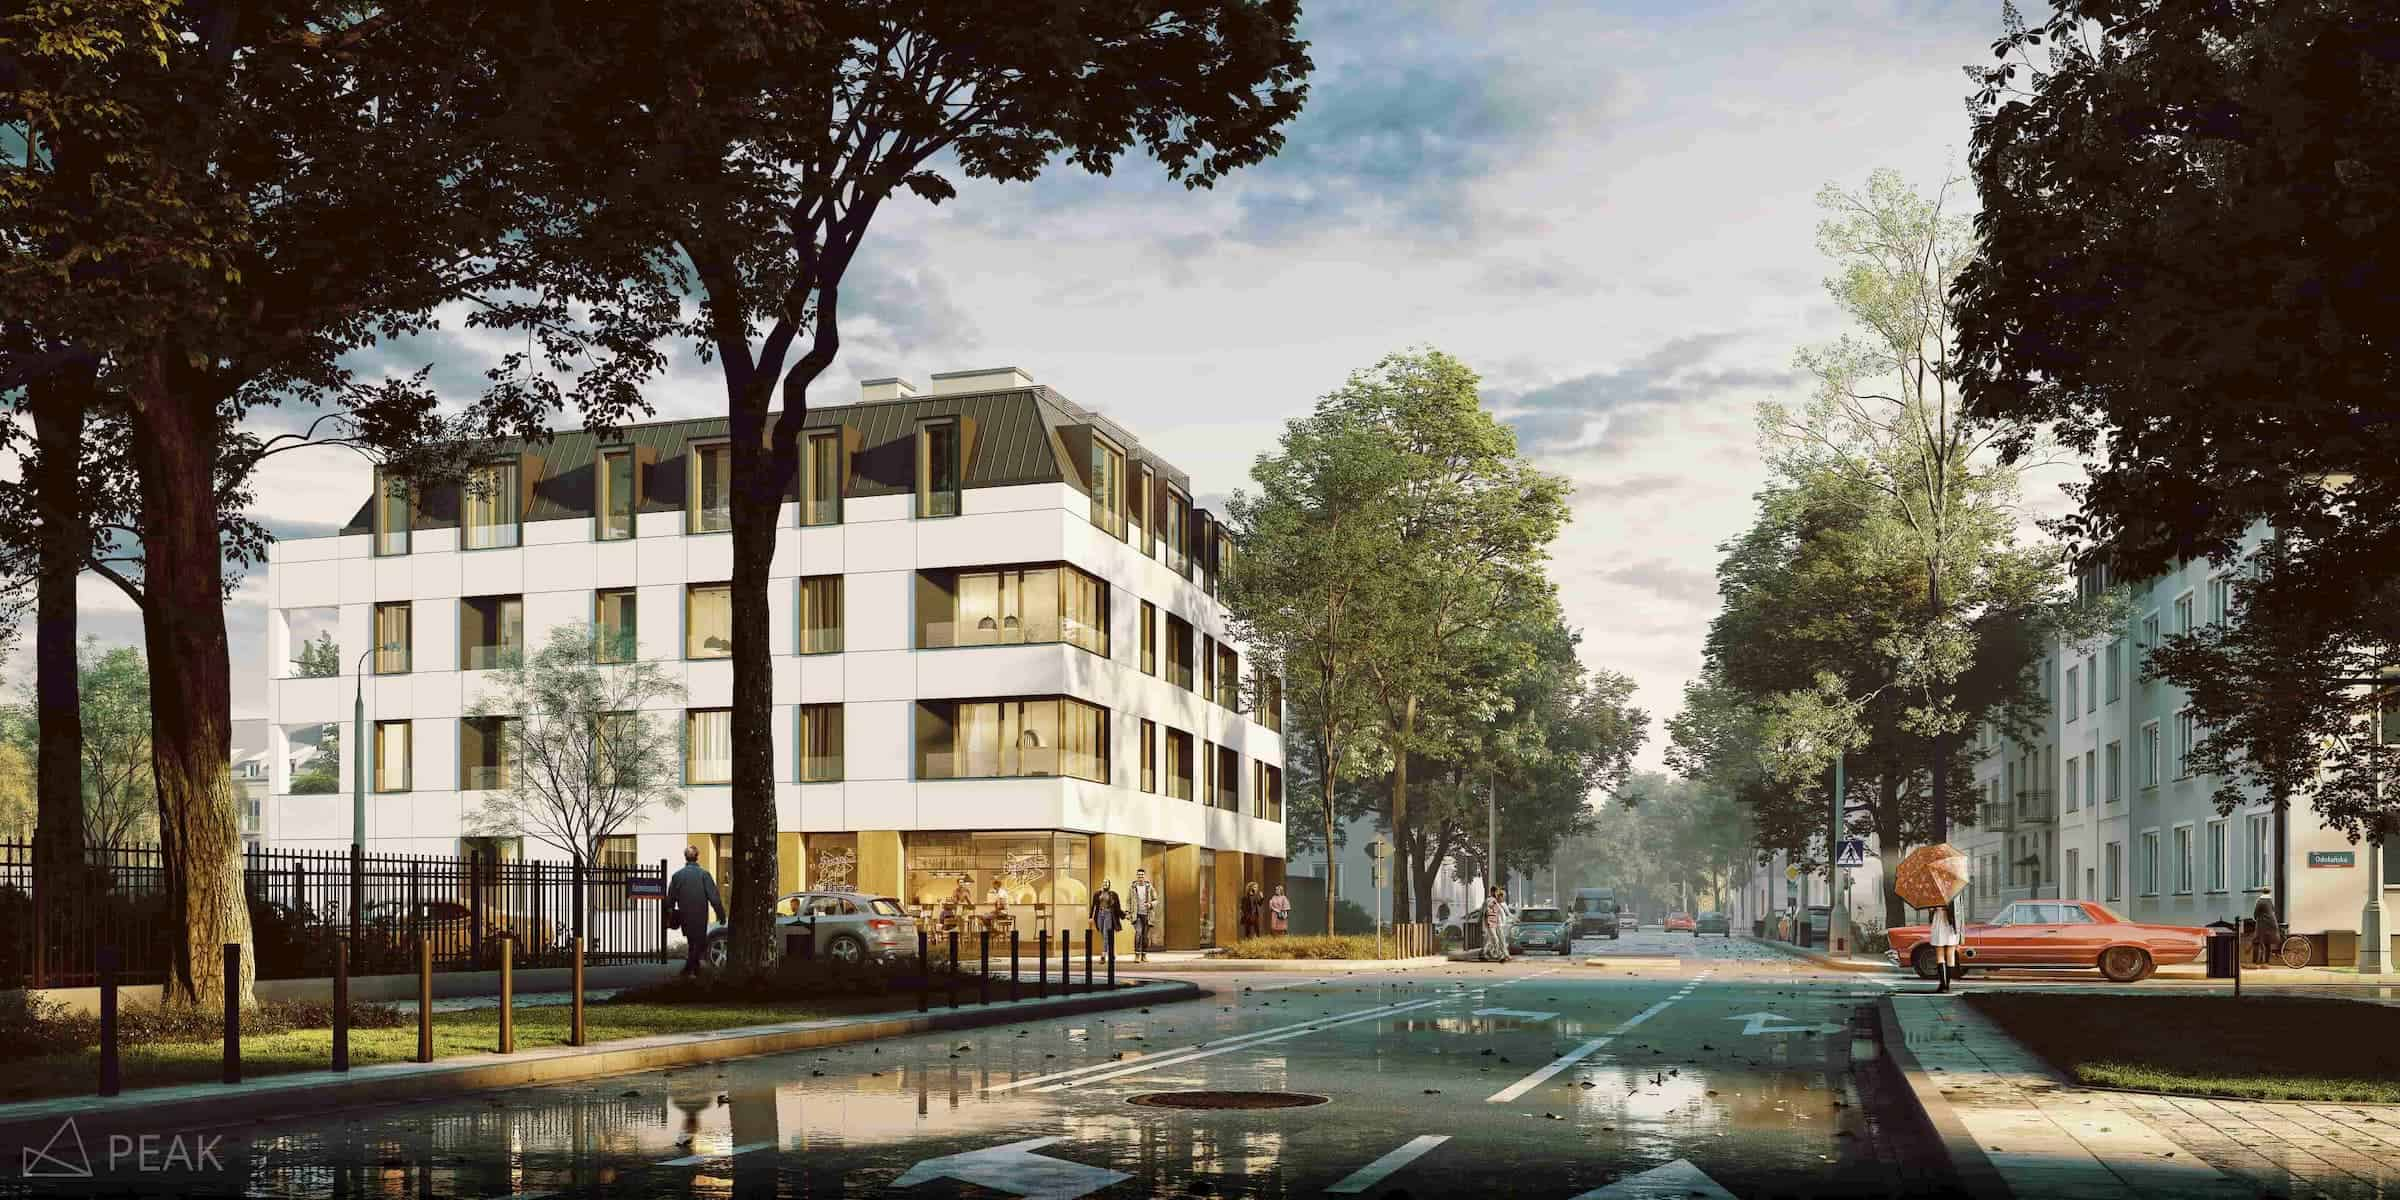 Apartment building in Warsaw Atelier 3 Girtler & Girtler 2017